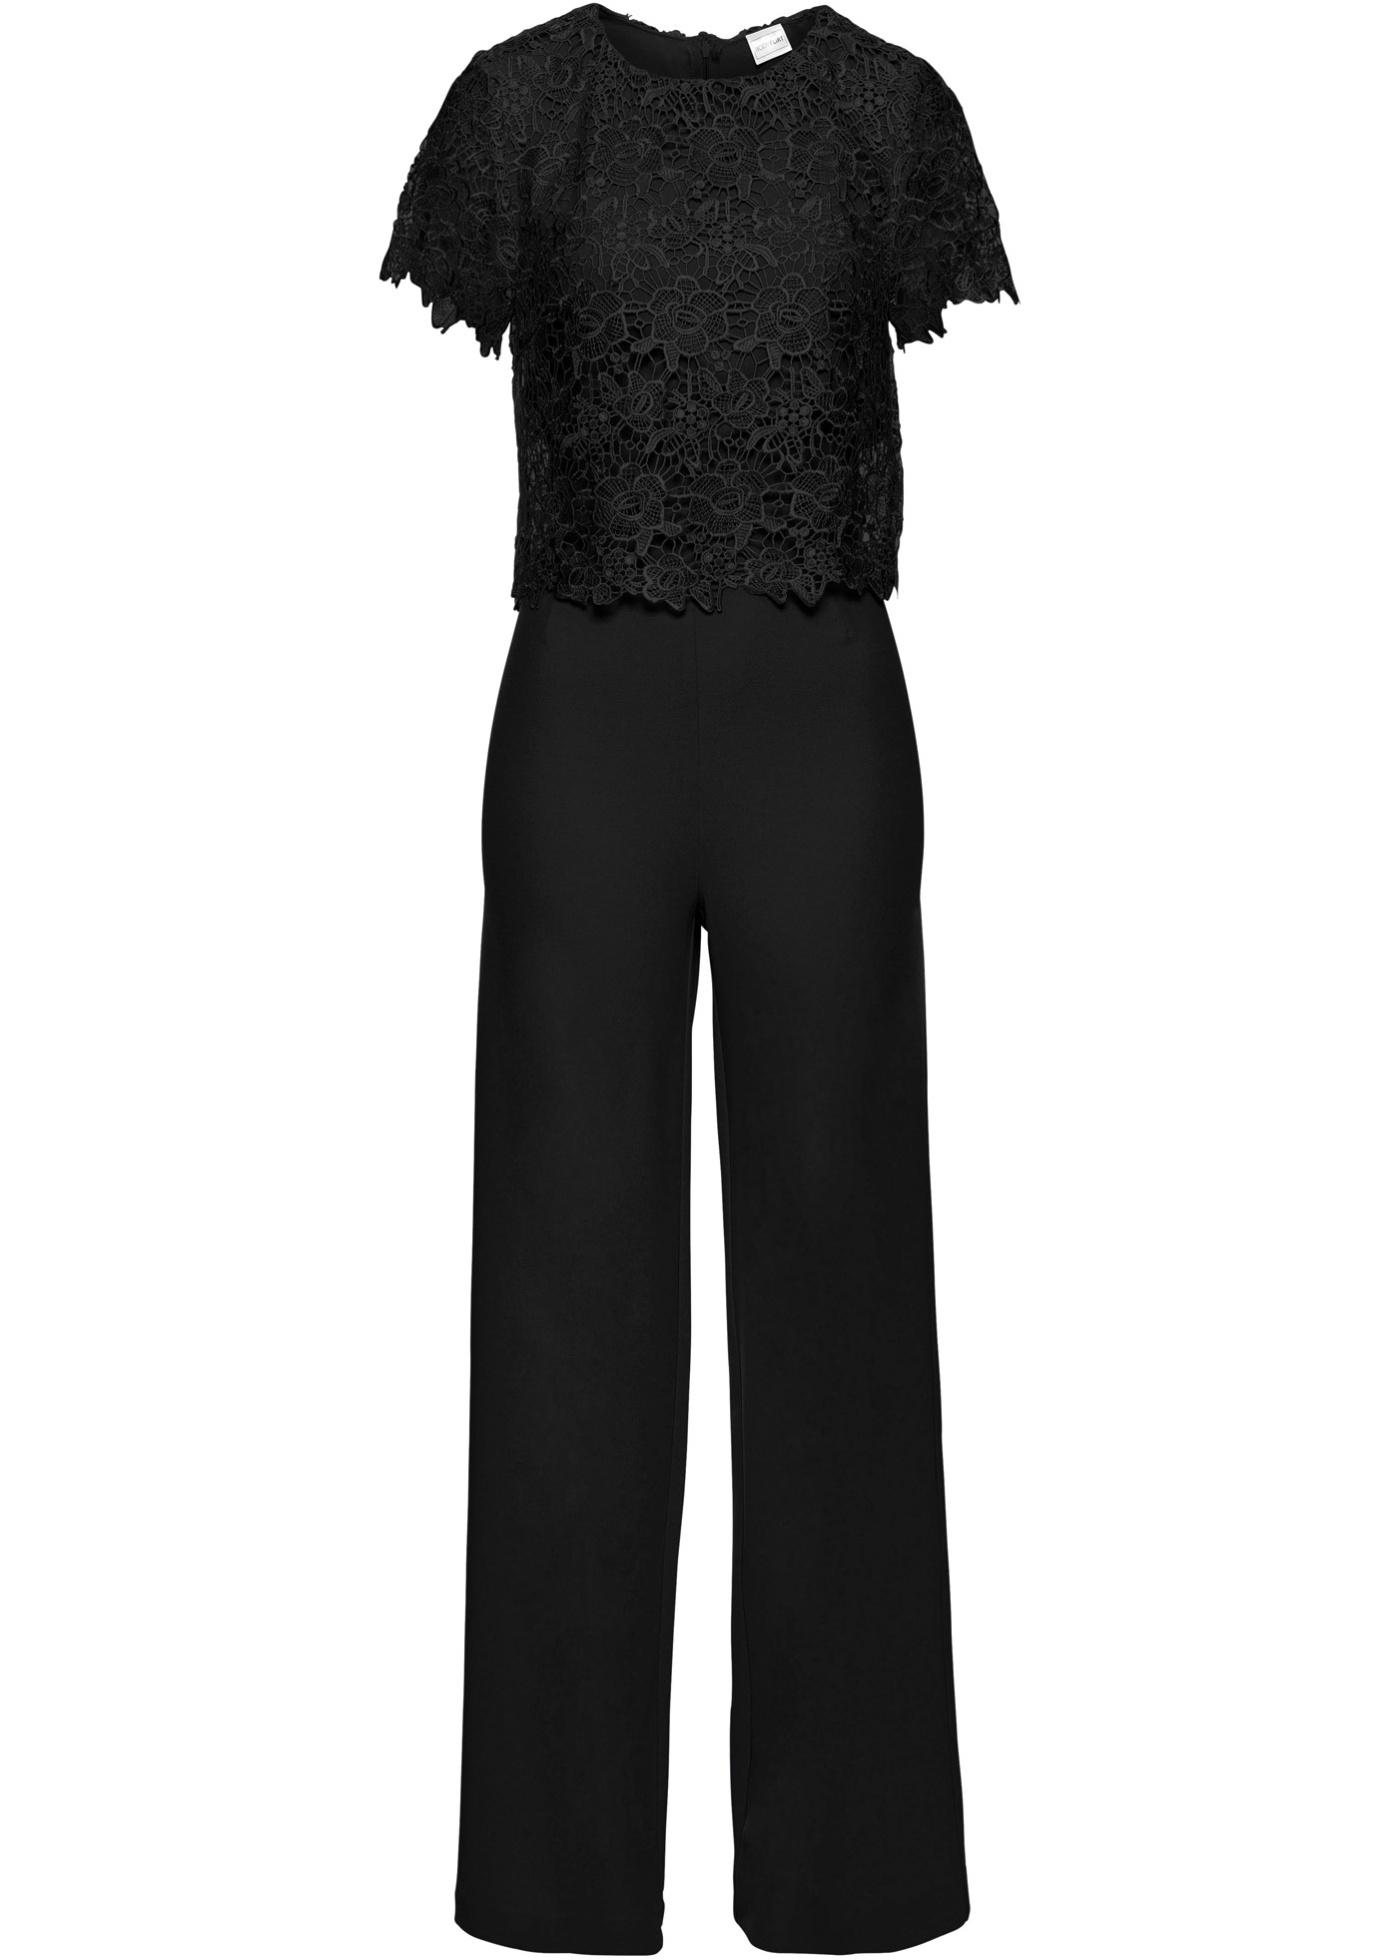 Hosen - Jumpsuit mit Spitze › bonprix › schwarz  - Onlineshop Bonprix